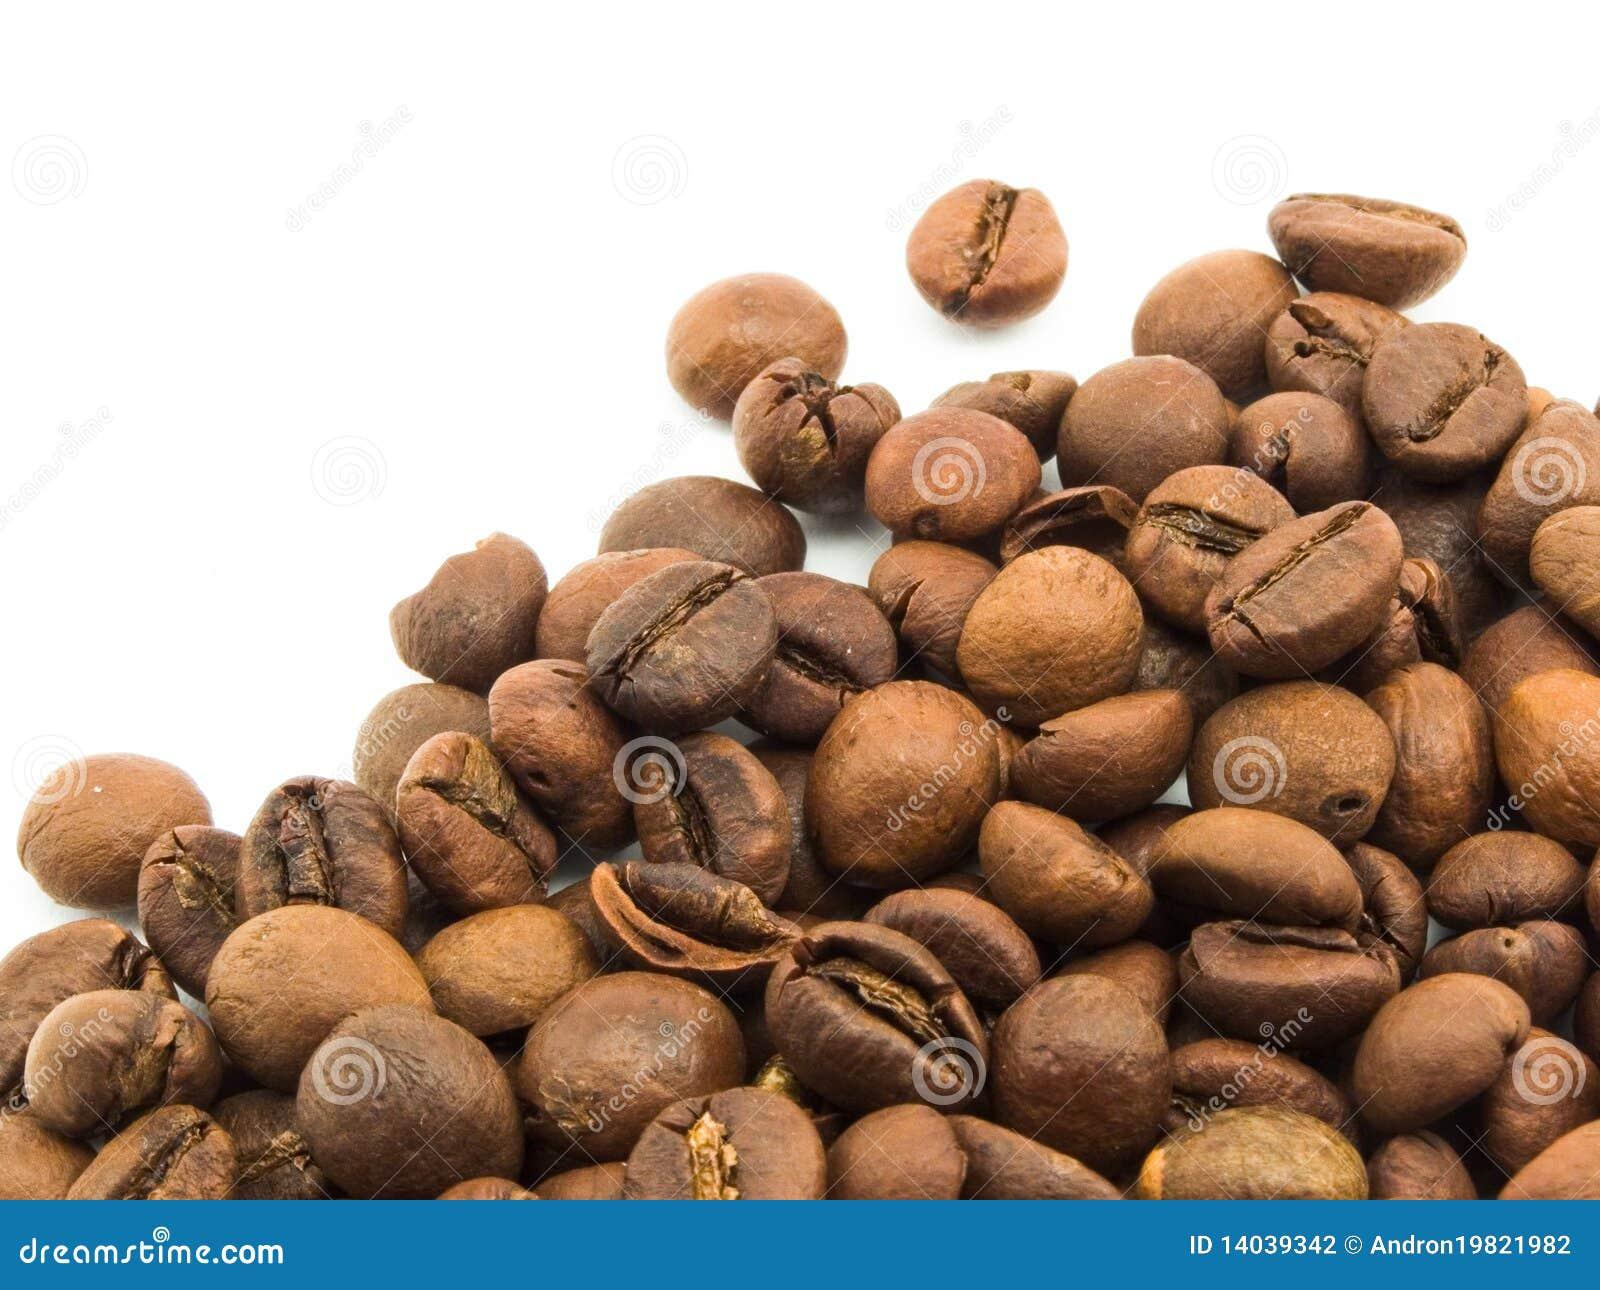 coffee grain stock photography image 14039342. Black Bedroom Furniture Sets. Home Design Ideas